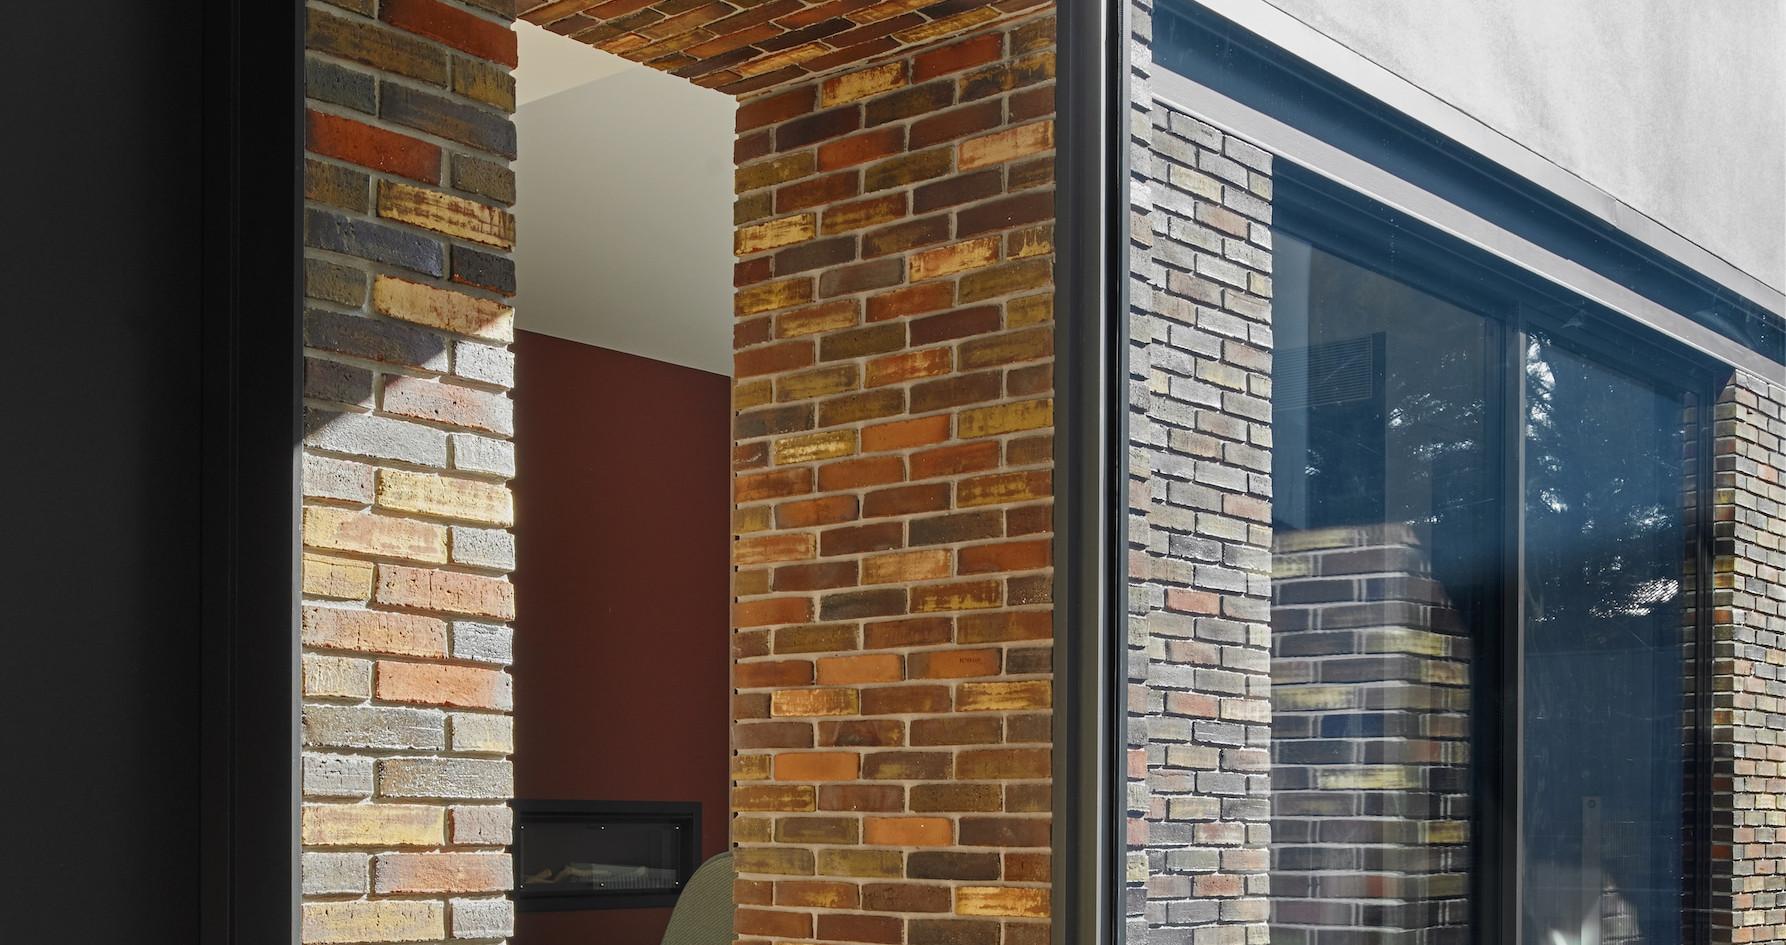 Petersen bricks, D47 and D48 bricks